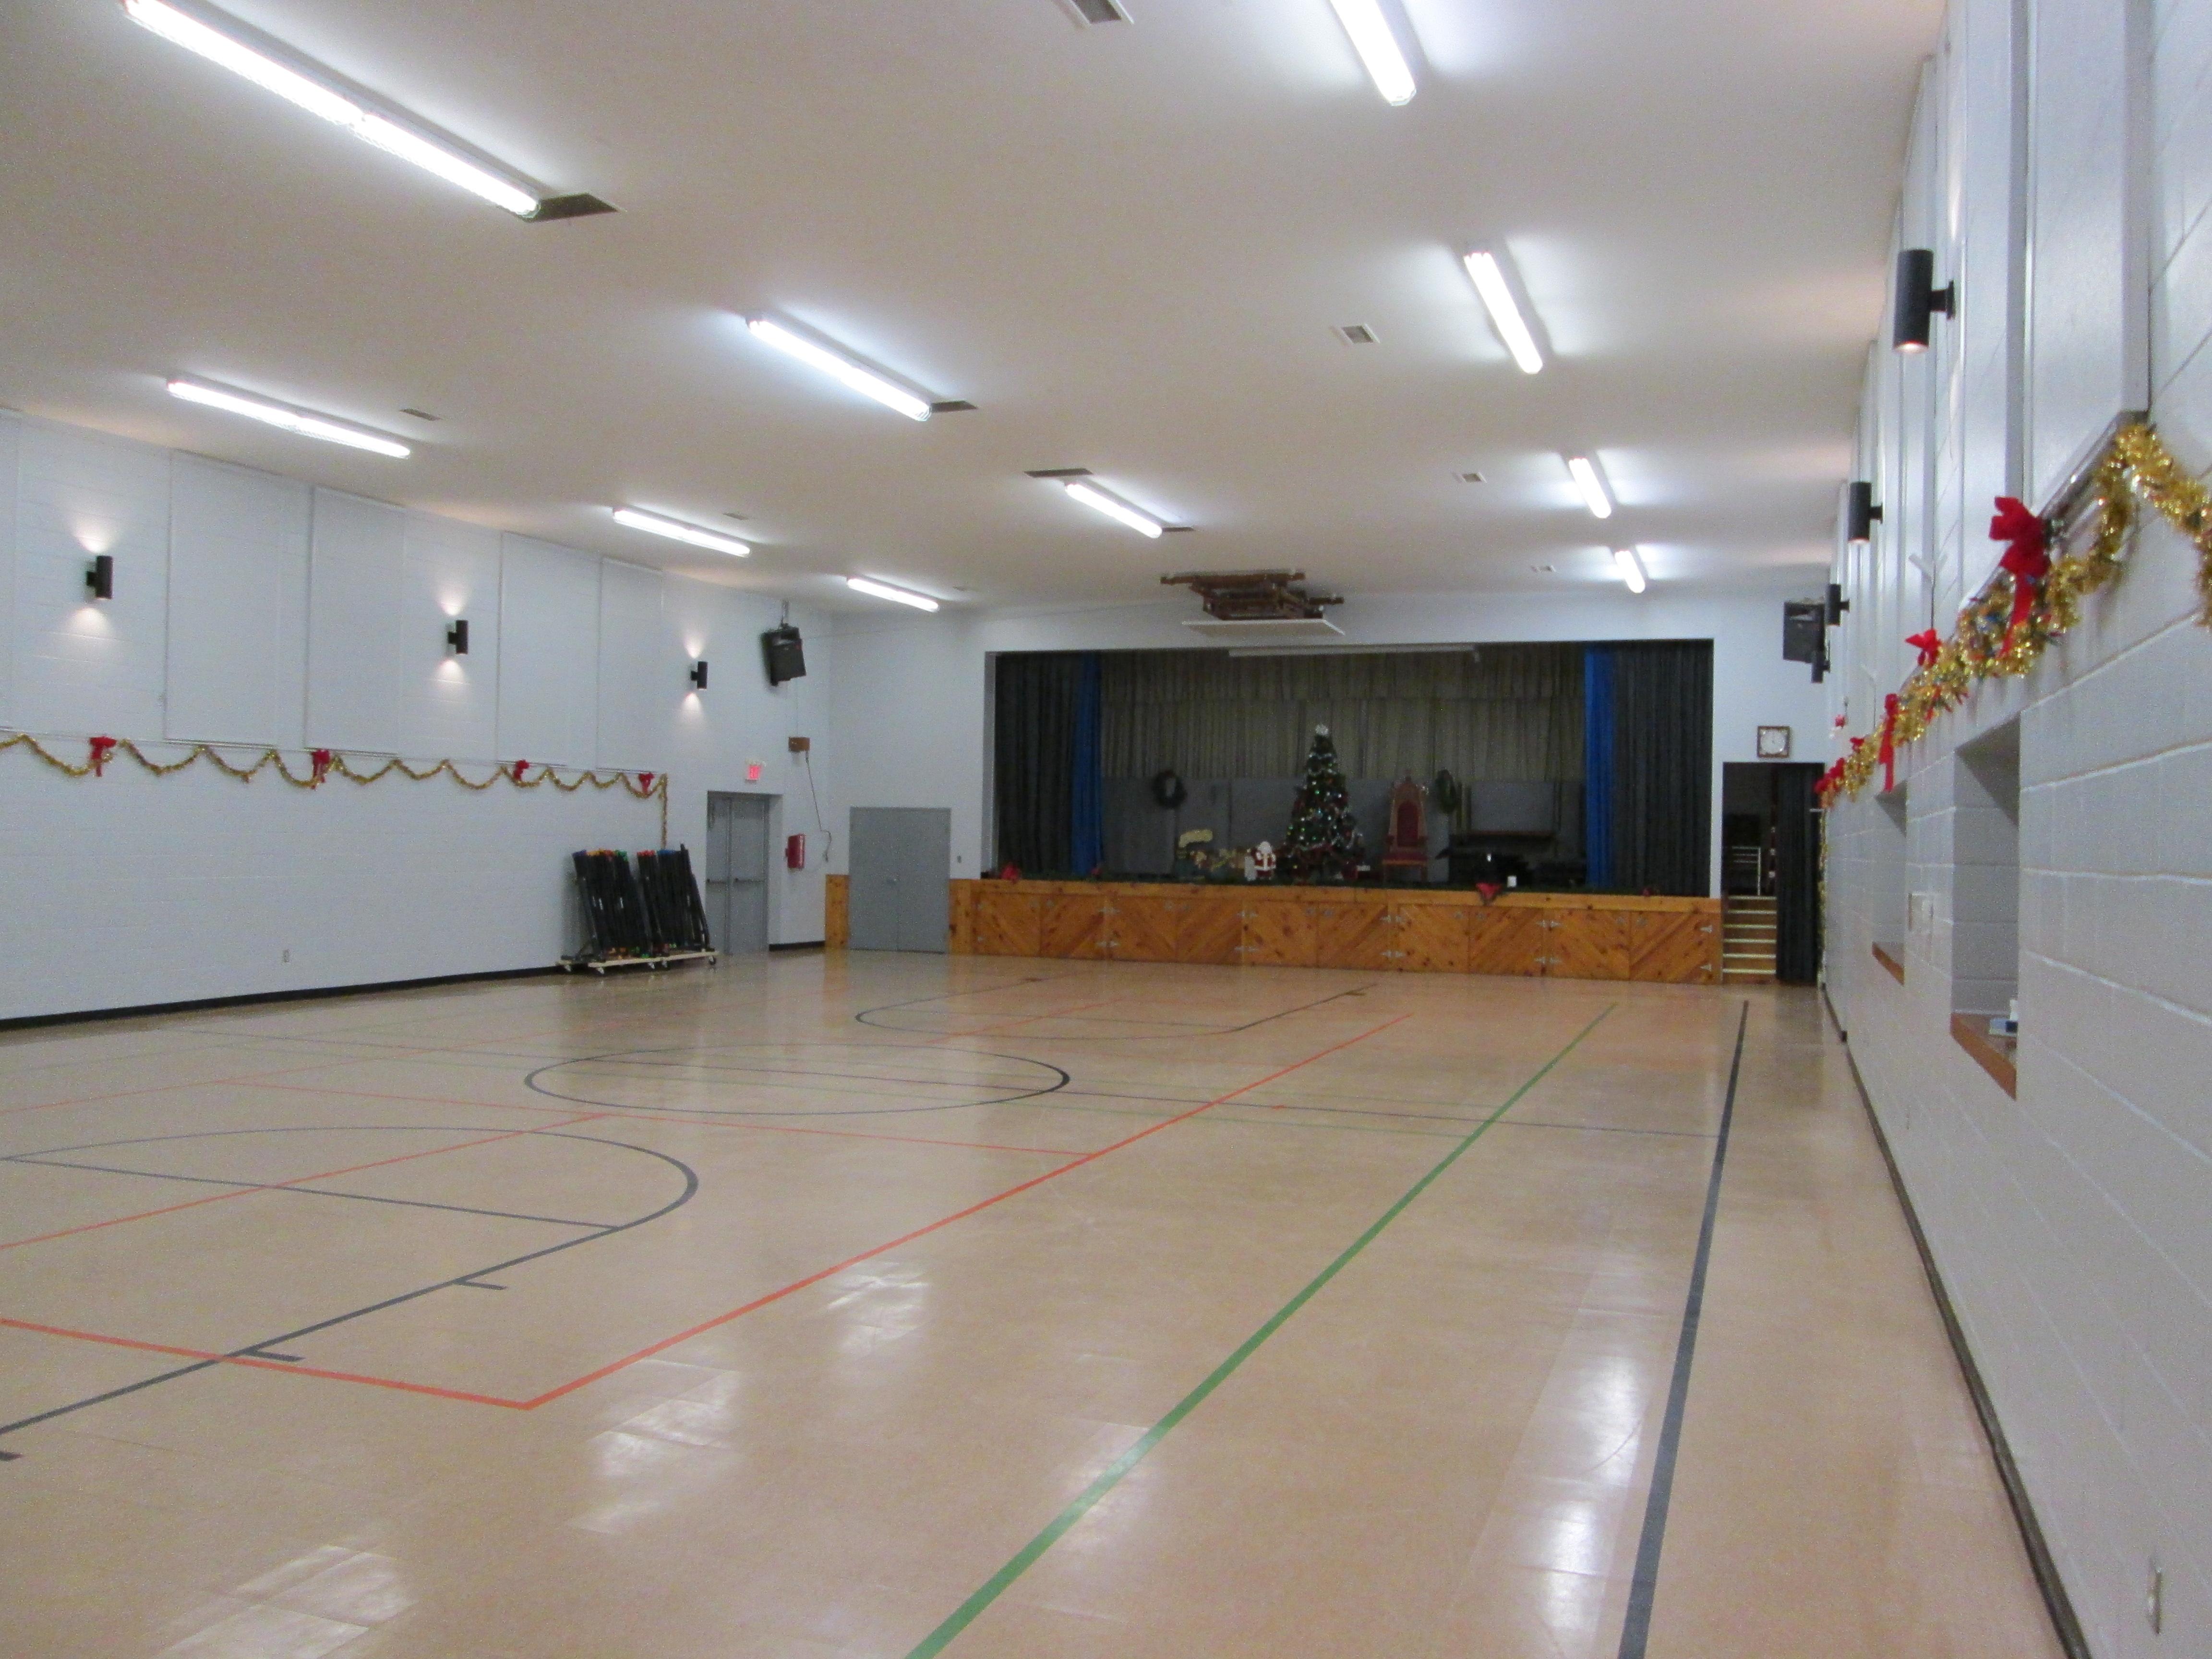 Gymnasium Stage View